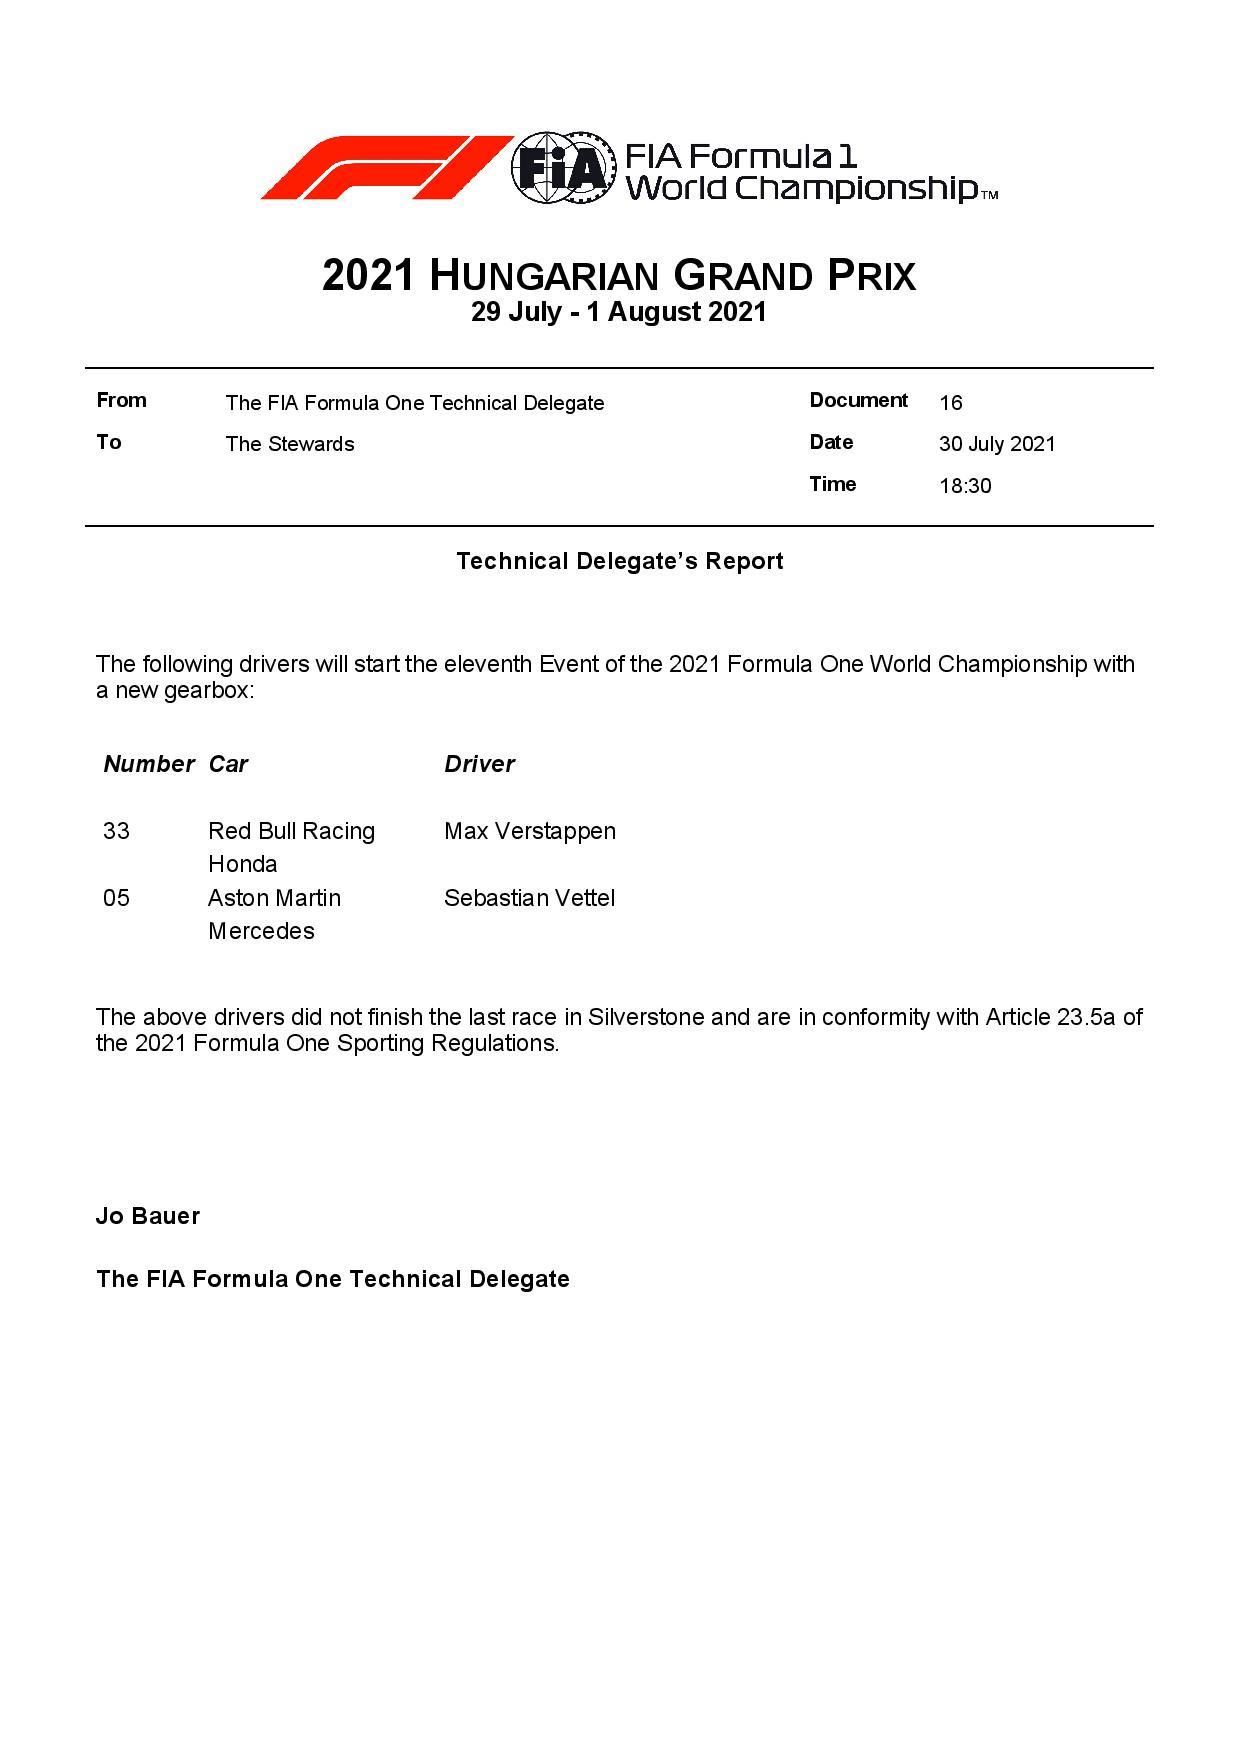 F1 - Boîte de vitesses neuve pour Verstappen et Vettel à Budapest